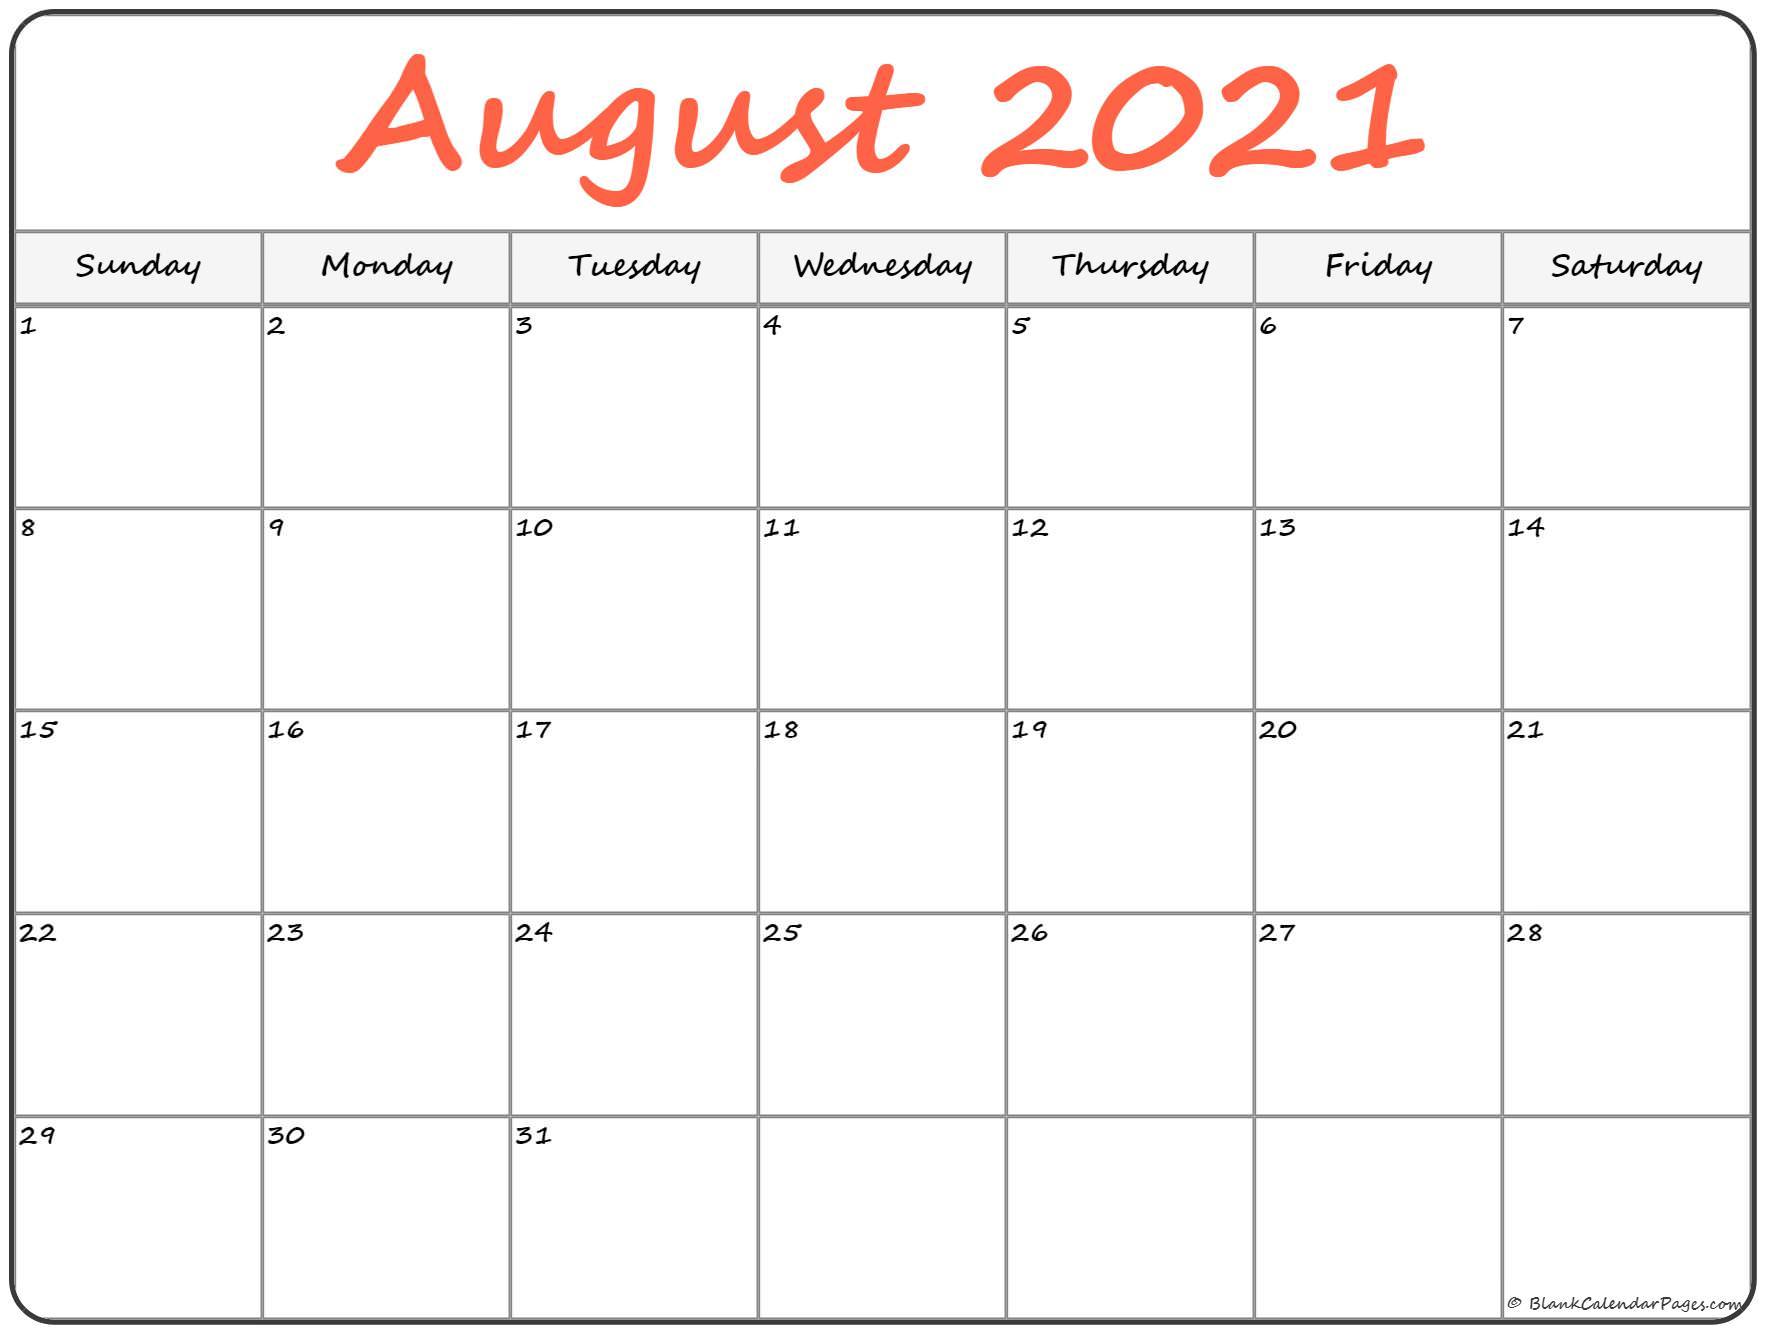 August 2021 Calendar   Free Printable Calendar Templates